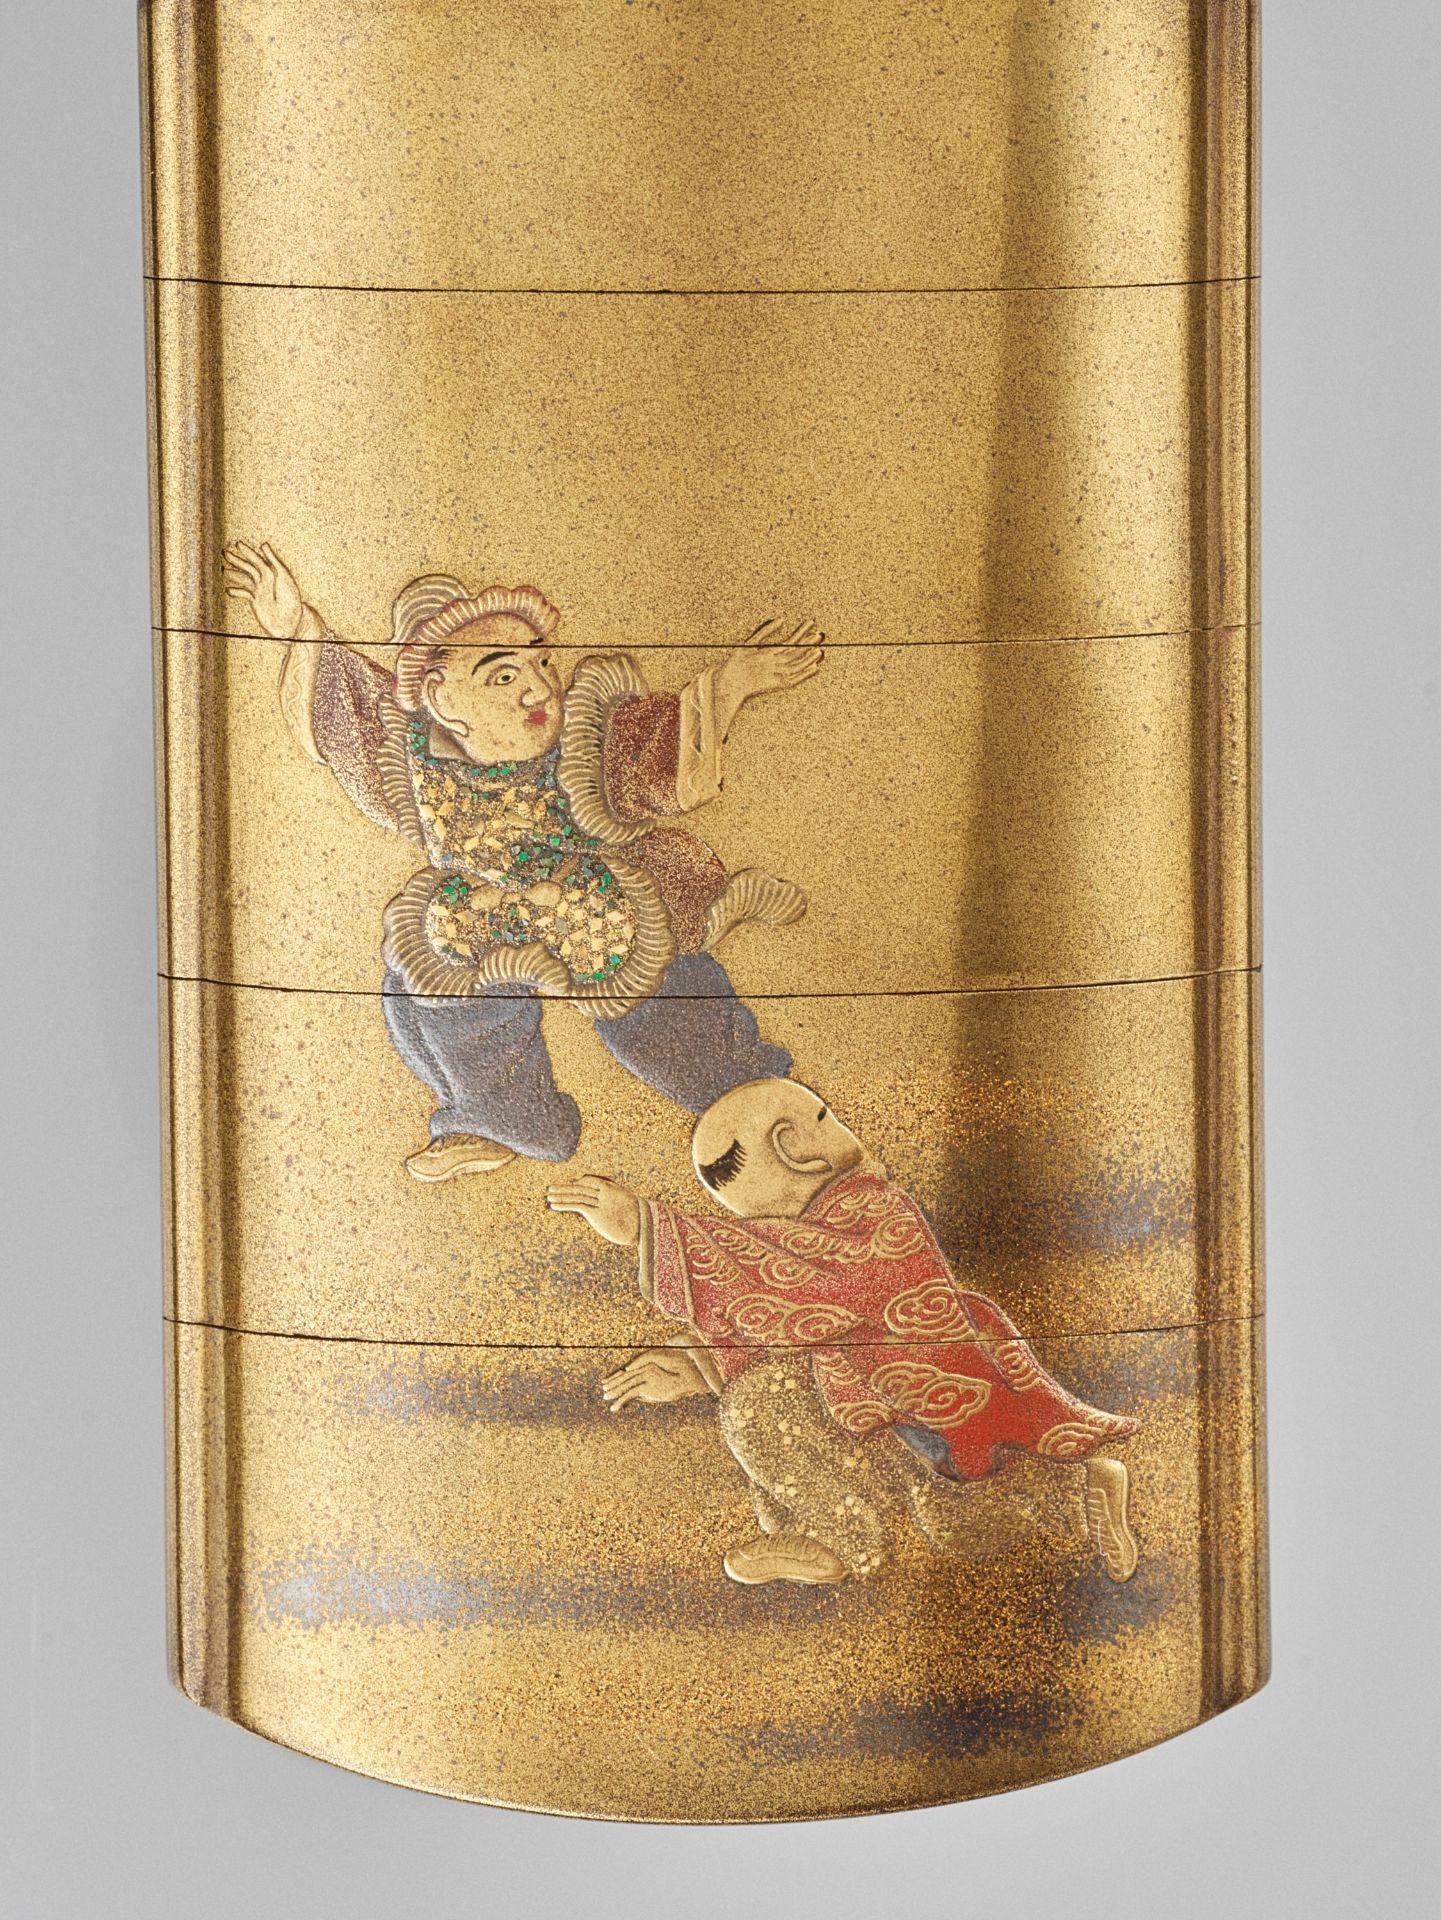 JOKASAI: A FINE GOLD LACQUER FOUR-CASE INRO DEPICTING SHIBA ONKO - Image 2 of 5